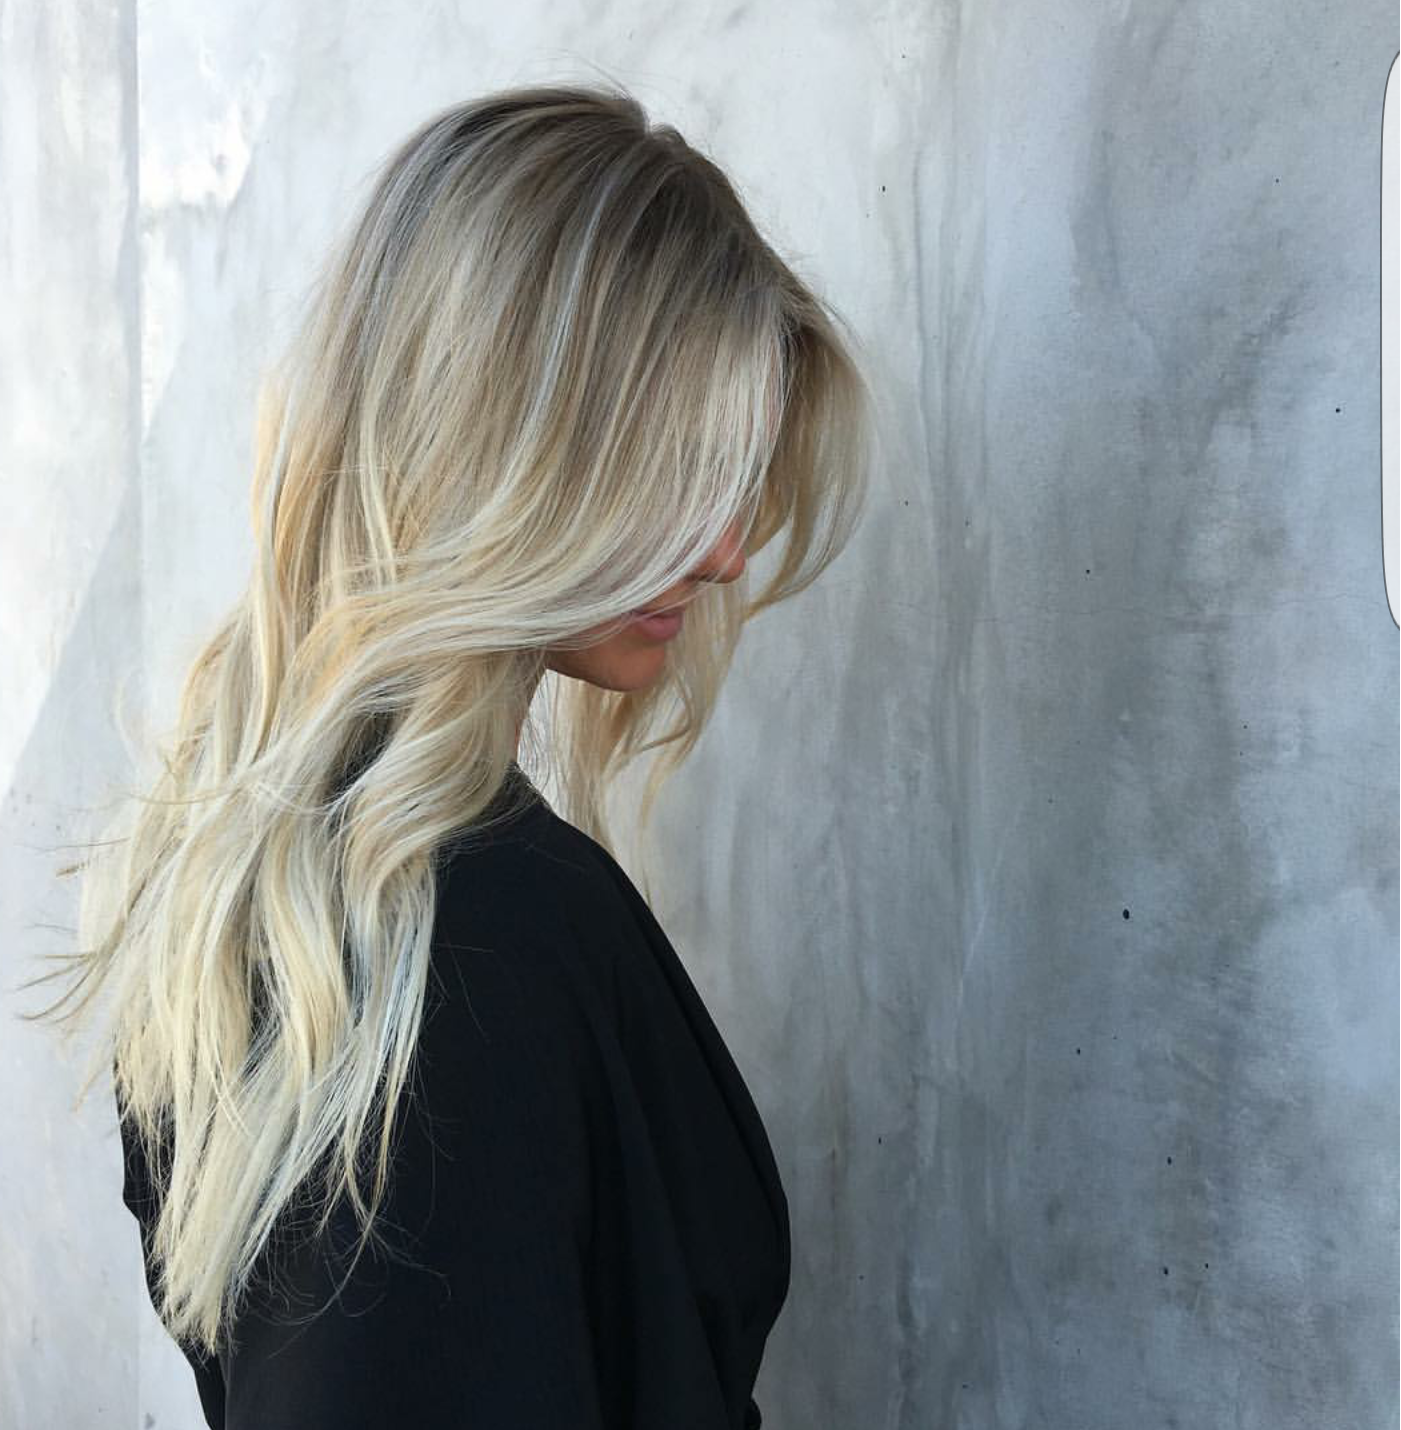 Intrepid Hearts:Icy blonde Hair by HairbyShaylee at Nine Zero One Salon